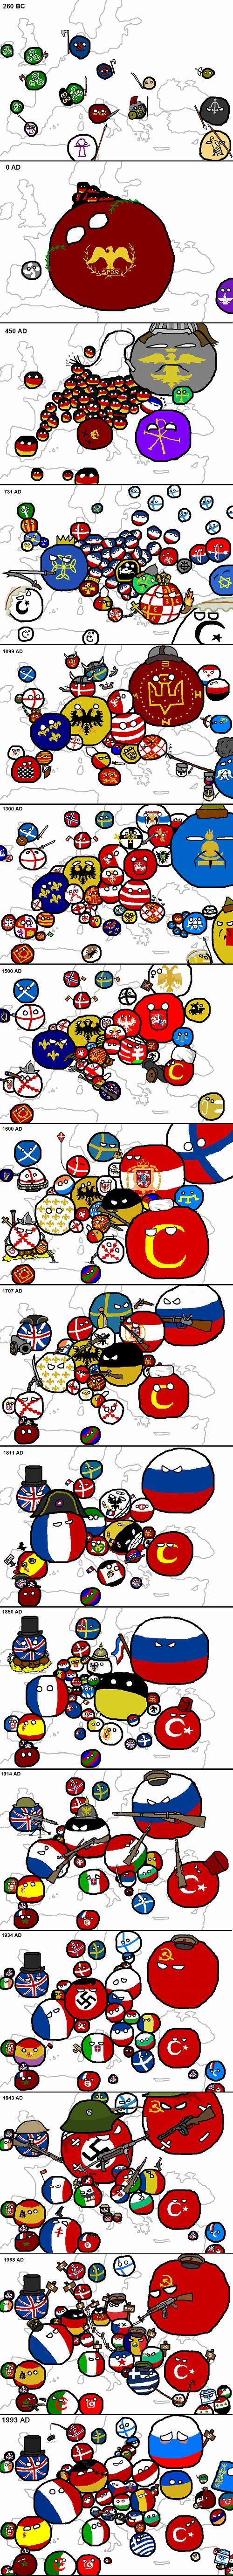 europe_history.jpg